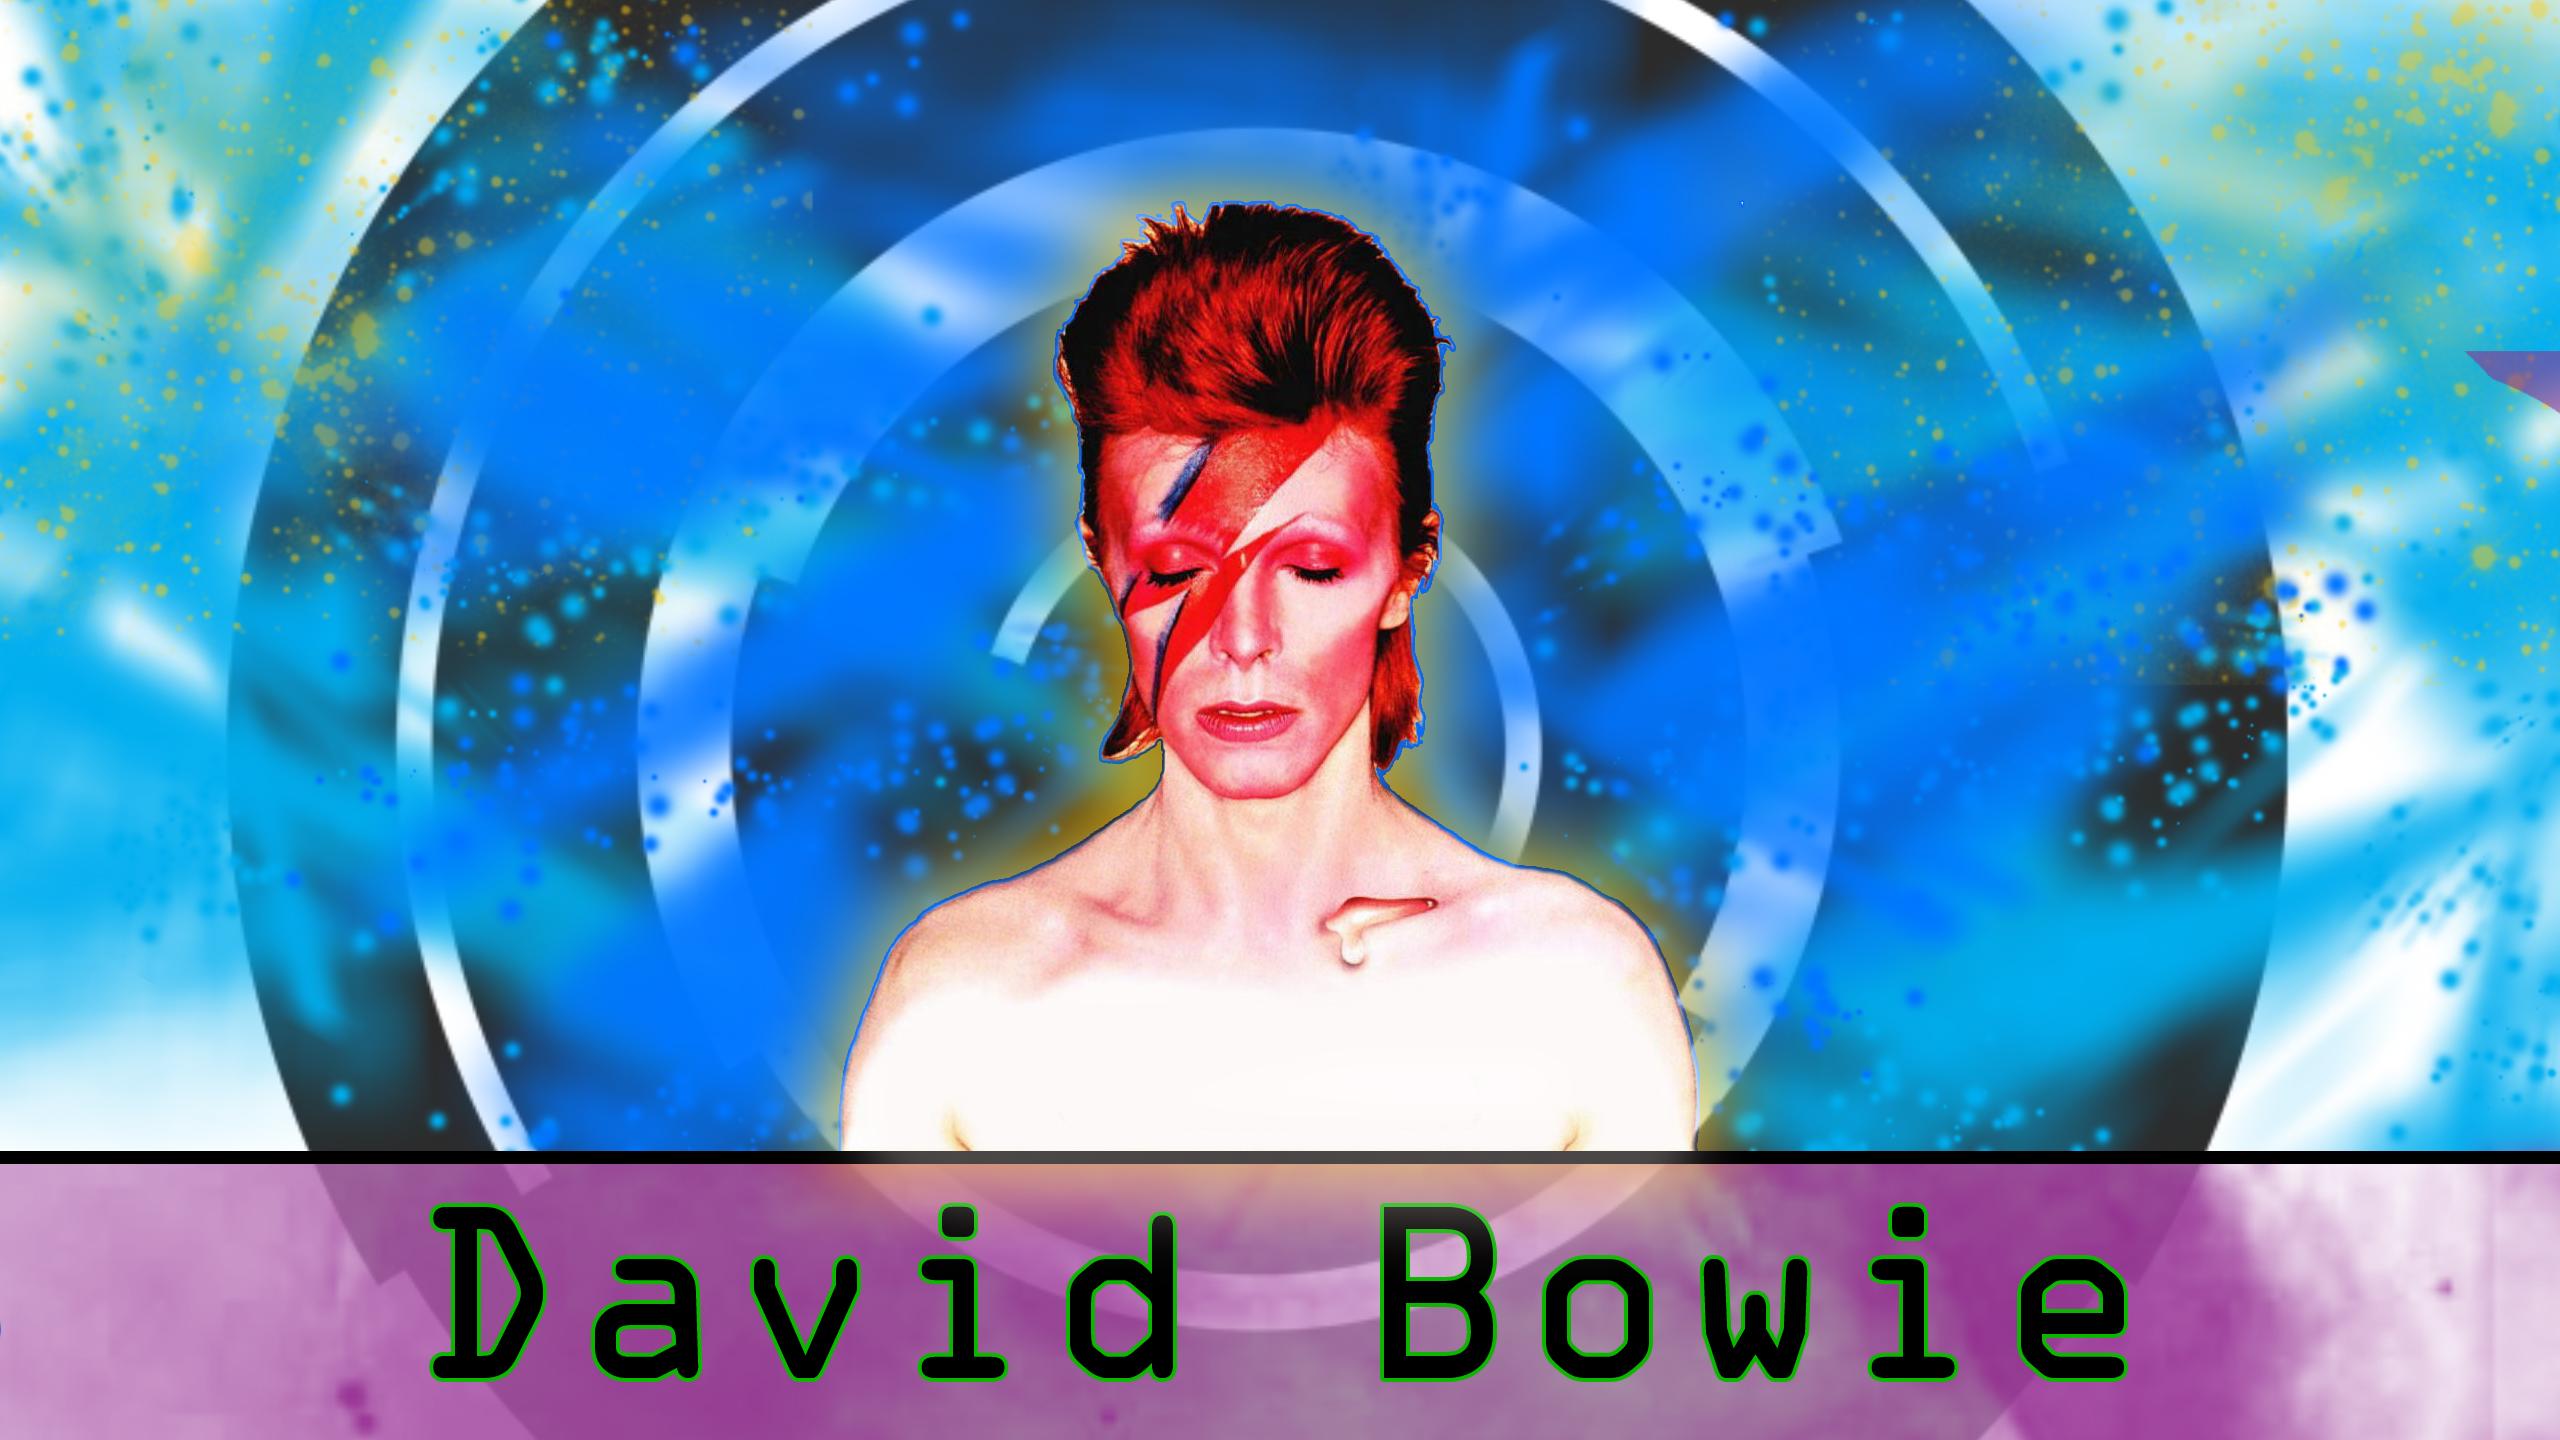 Ziggy Stardust Wallpaper - David Bowie Photo (15503886 ...  David Bowie Ziggy Stardust Wallpaper